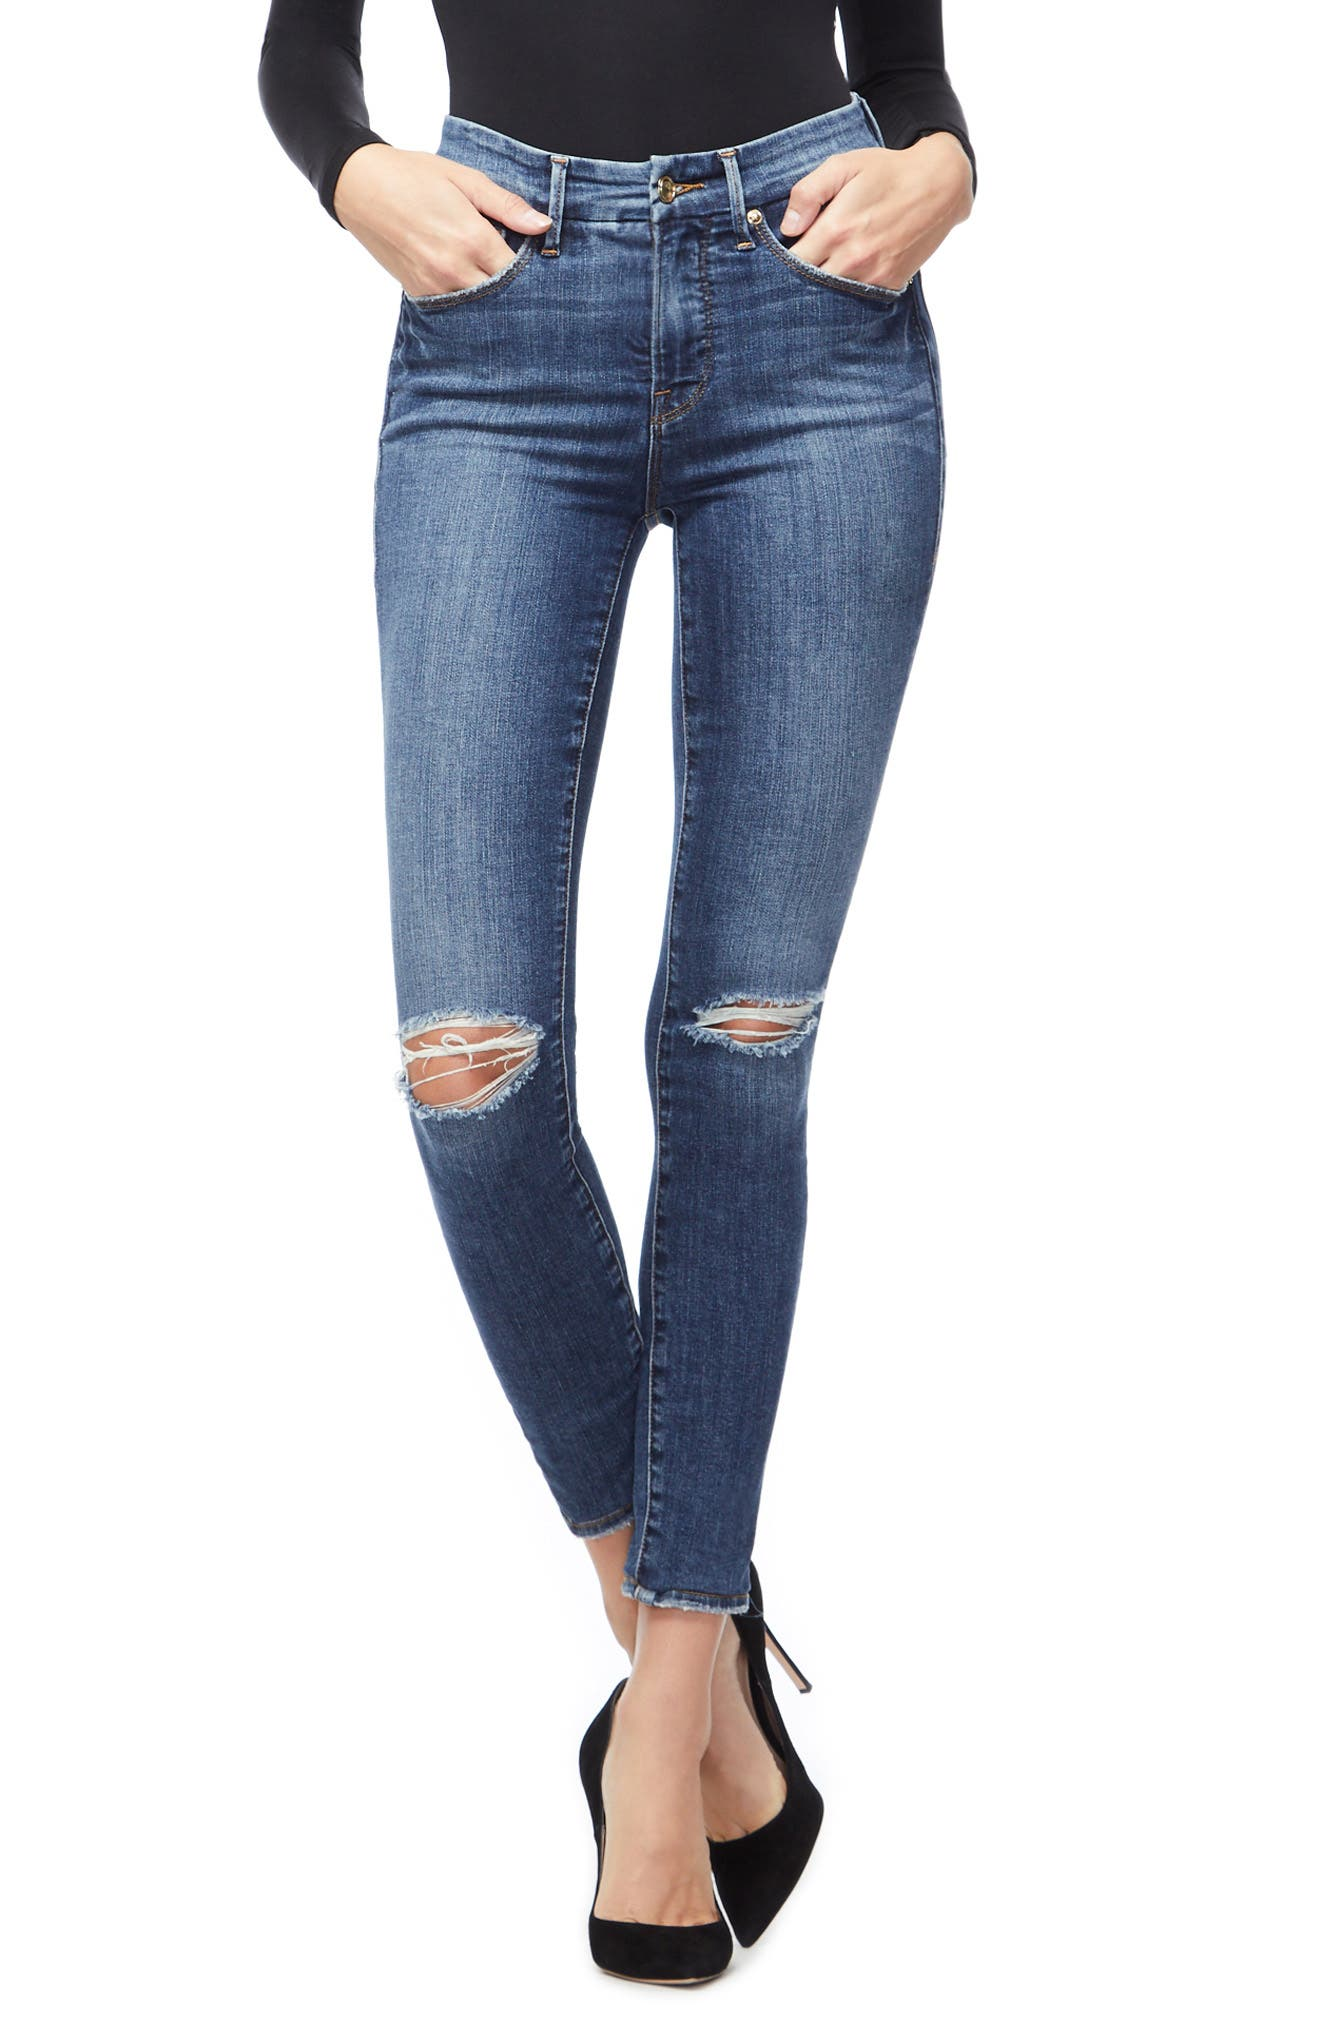 GOOD AMERICAN, Good Legs Ripped High Waist Skinny Jeans, Main thumbnail 1, color, BLUE208